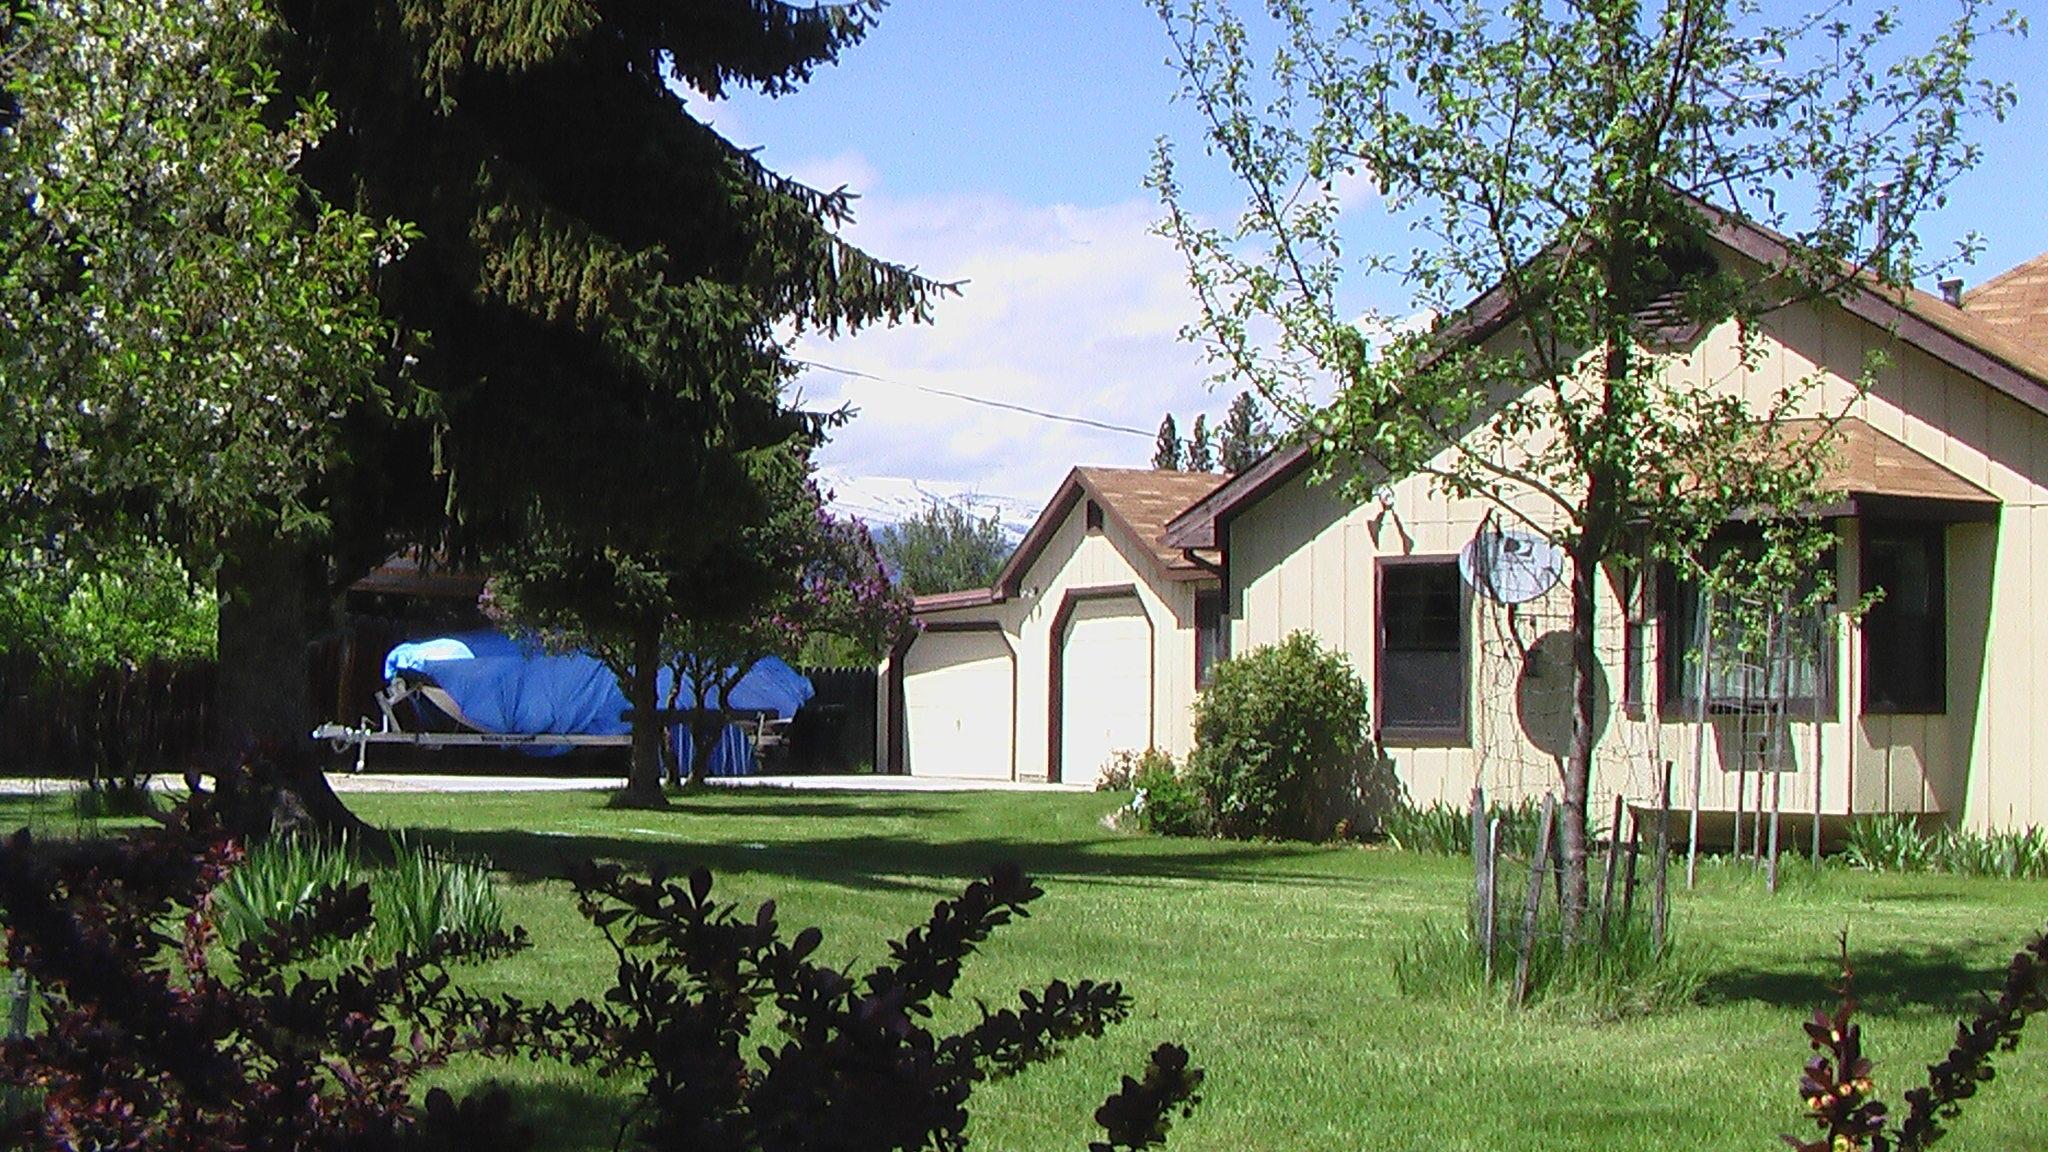 70 Woodside Cutoff, Road, Victor, MT 59875